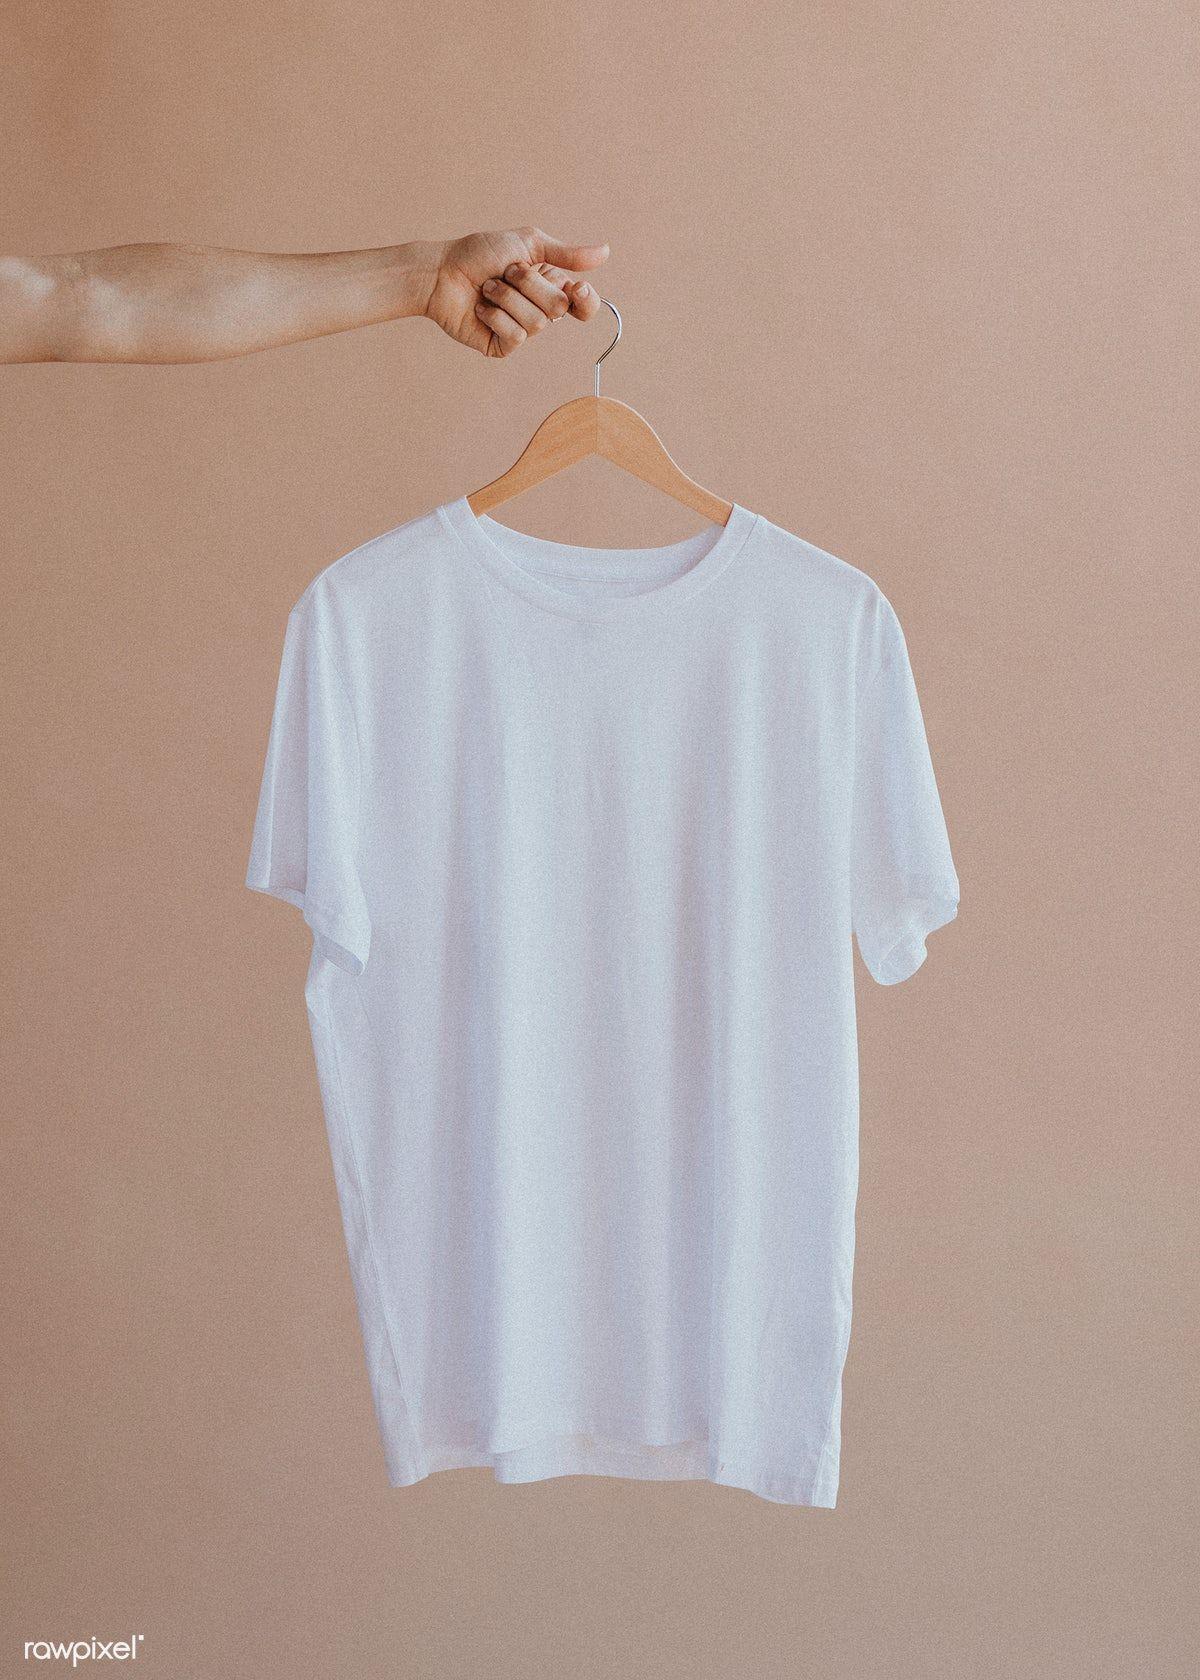 Download White Shirt In A Hanger Premium Image By Rawpixel Com Felix Plain White T Shirt Planet Shirts Plain White Shirt